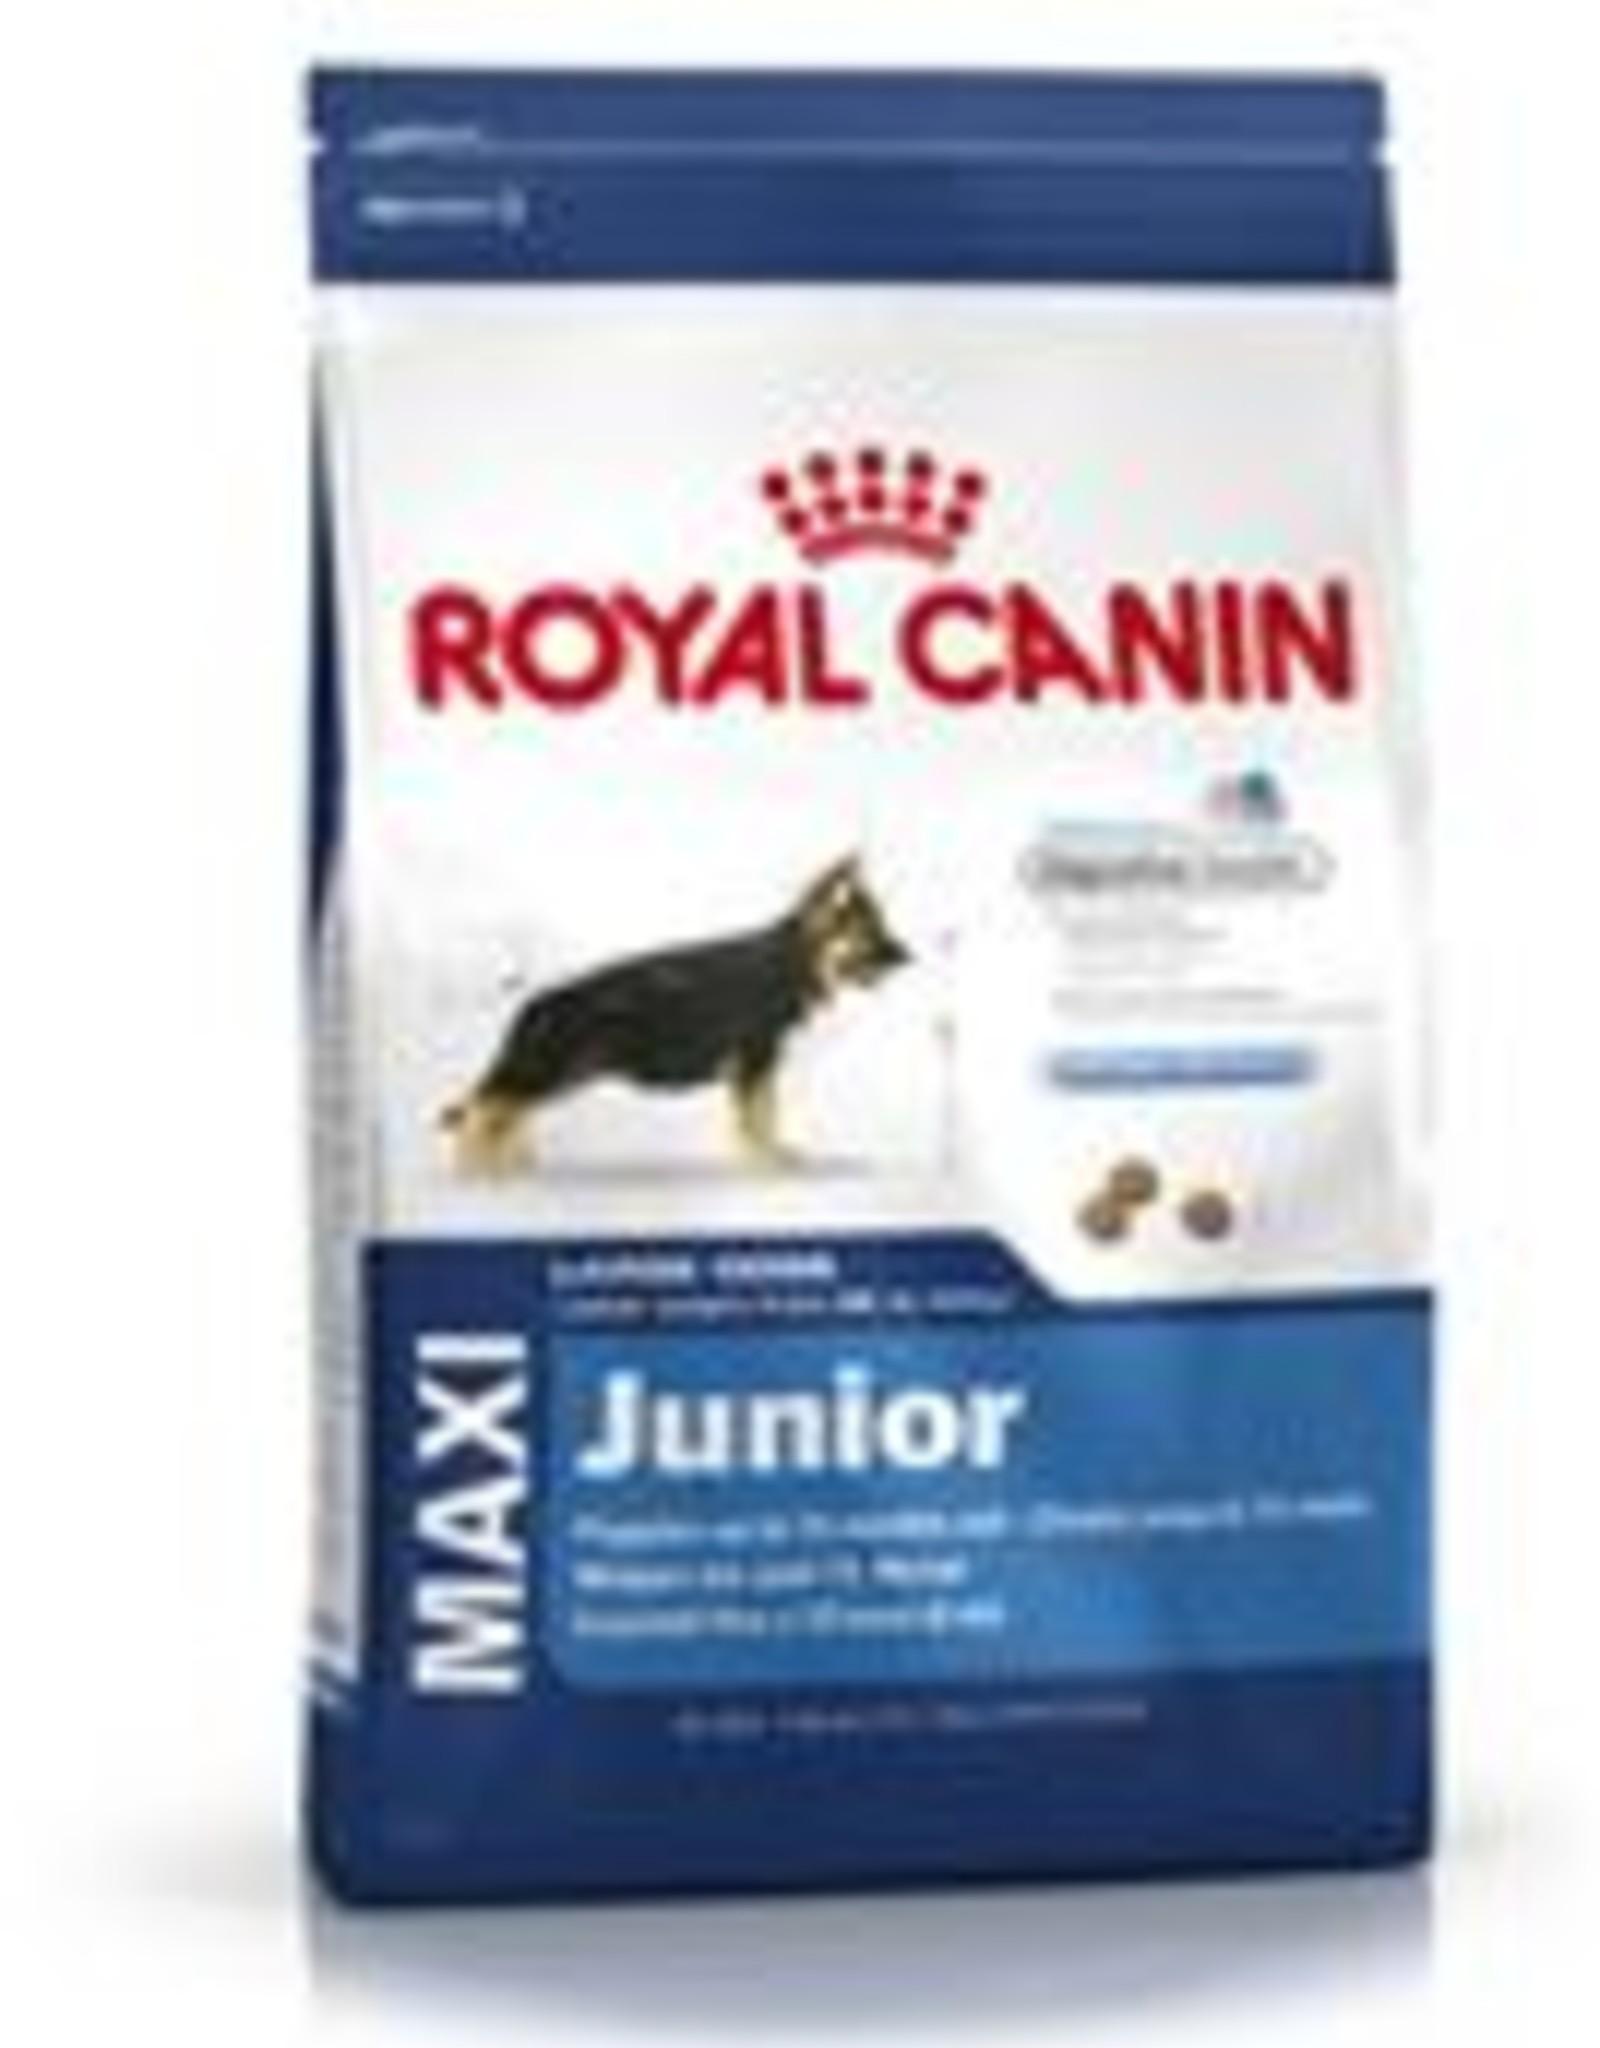 Royal Canin Royal Canin Shn Maxi Puppy Hond 10kg